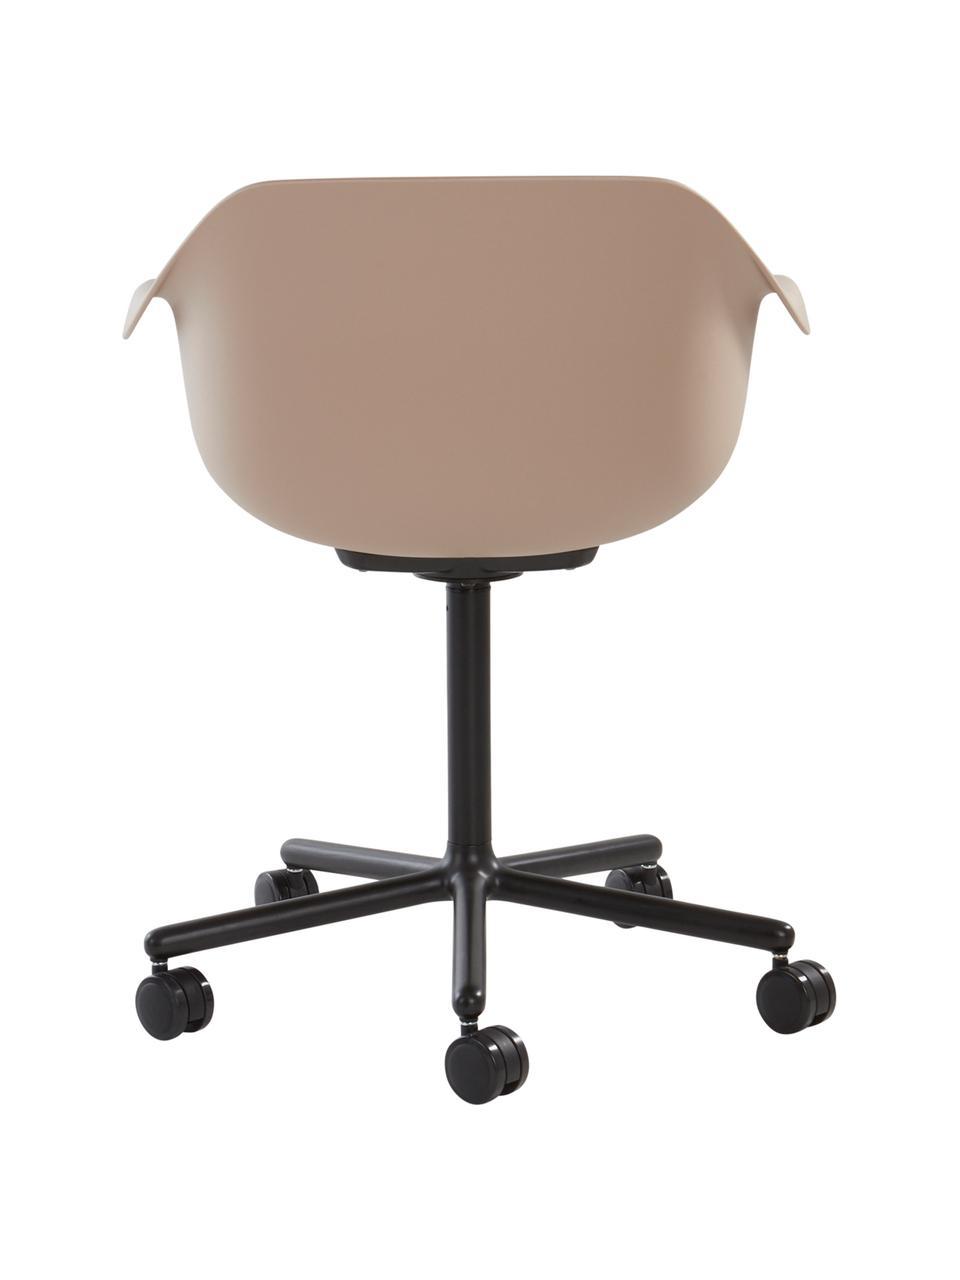 Silla de oficina giratoria Warrington, Asiento: polipropileno, Estructura: aluminio, Beige, negro, An 57 x F 63 cm